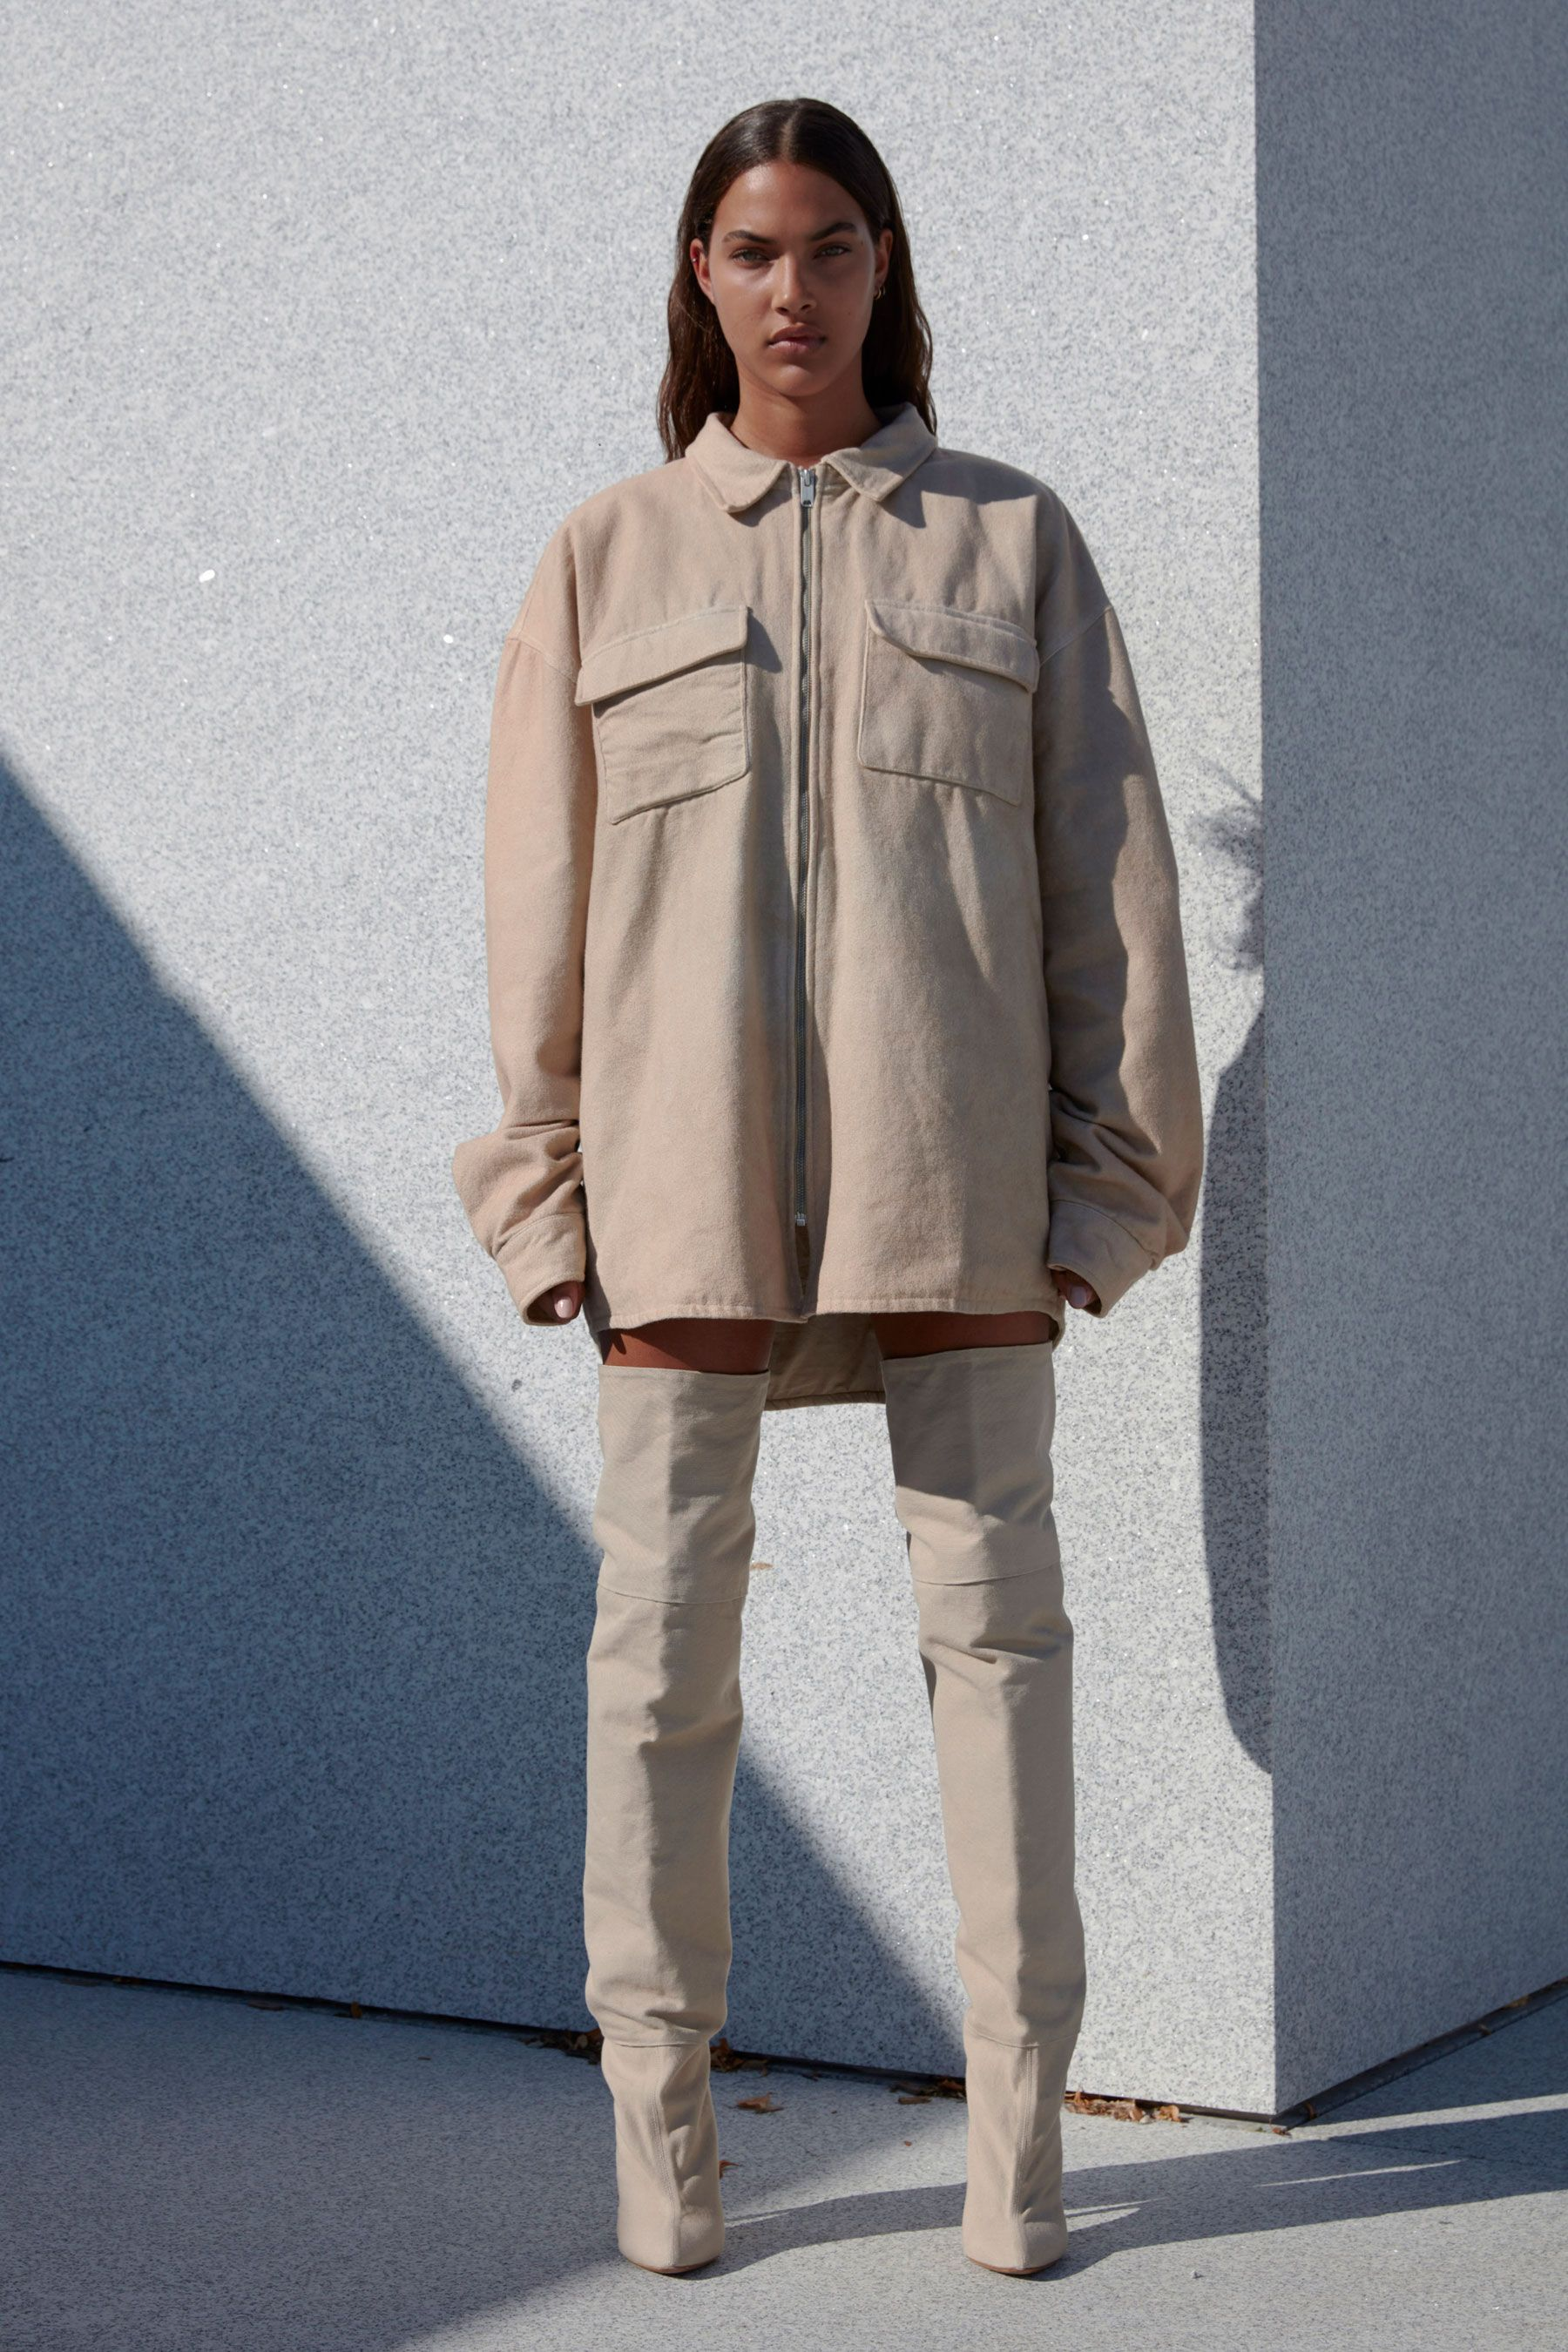 Enjoy Every Look From Kanye S Yeezy Season 4 Fashion Show Yeezy Fashion Fashion Spring 2017 Fashion Trends